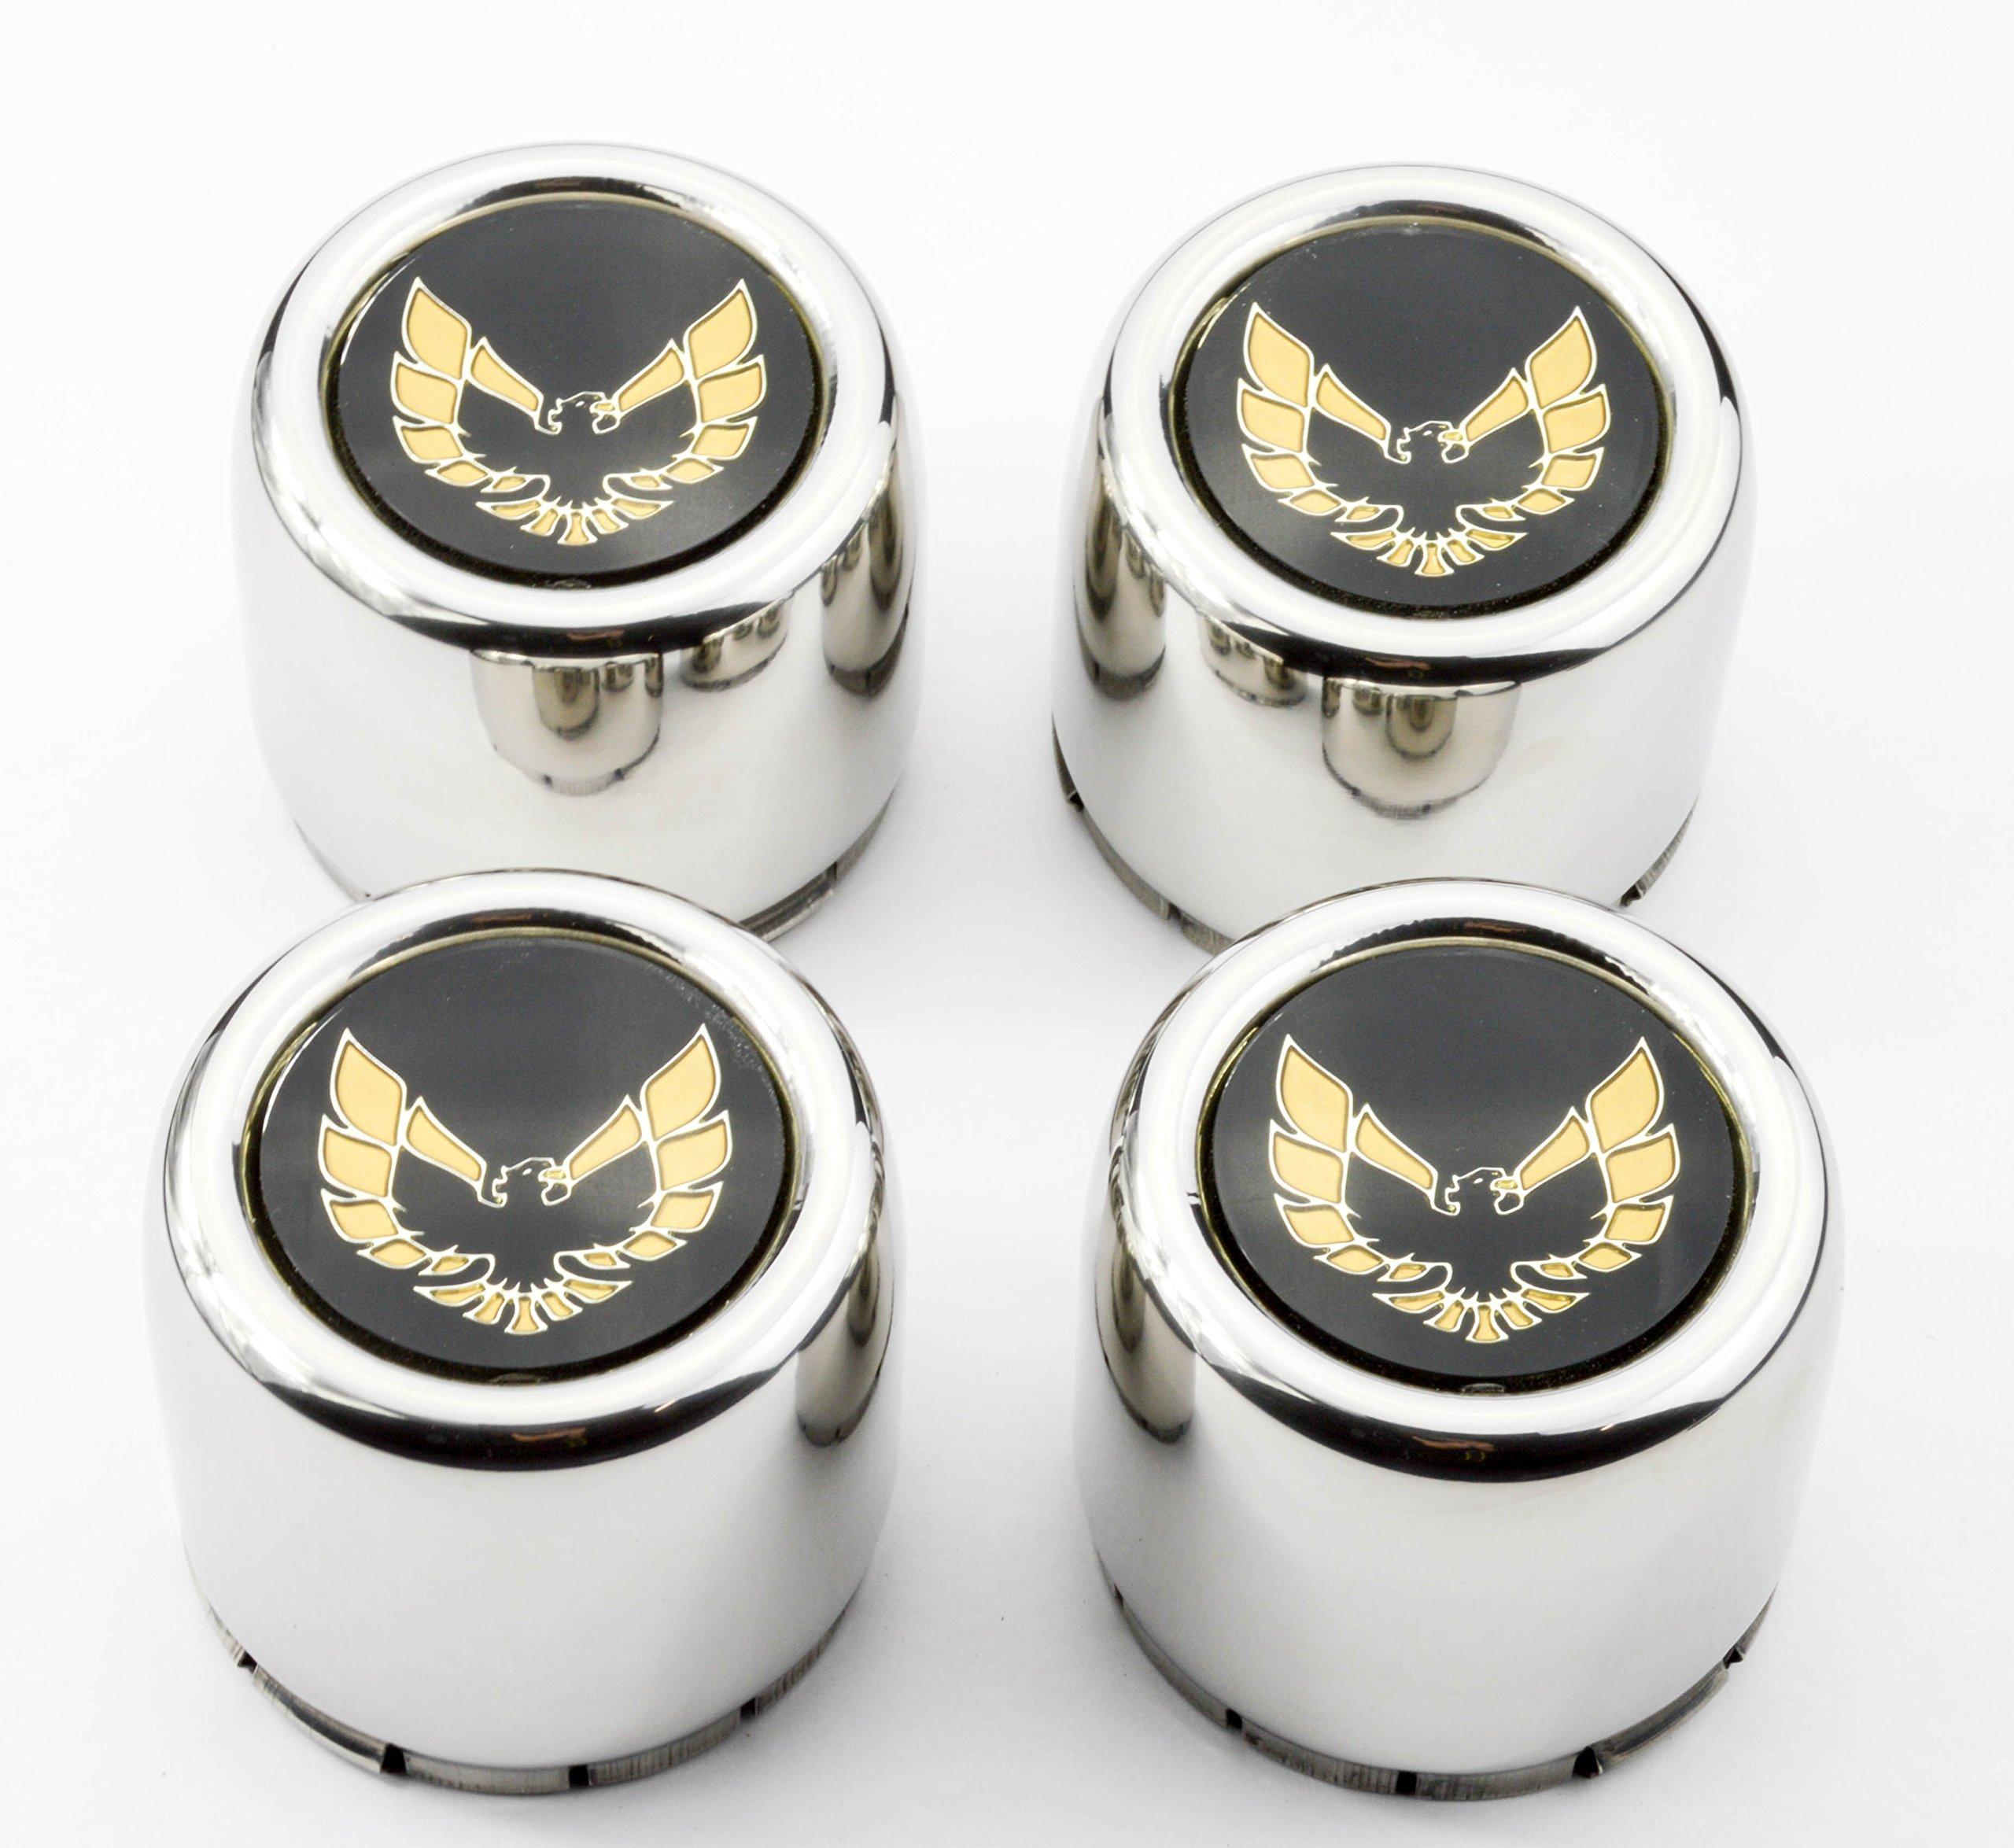 Set of 4 New 77-81 Firebird Trans Am TA Snowflake Turbo Wheel Stainless Steel Metal Center Caps Gold Bird